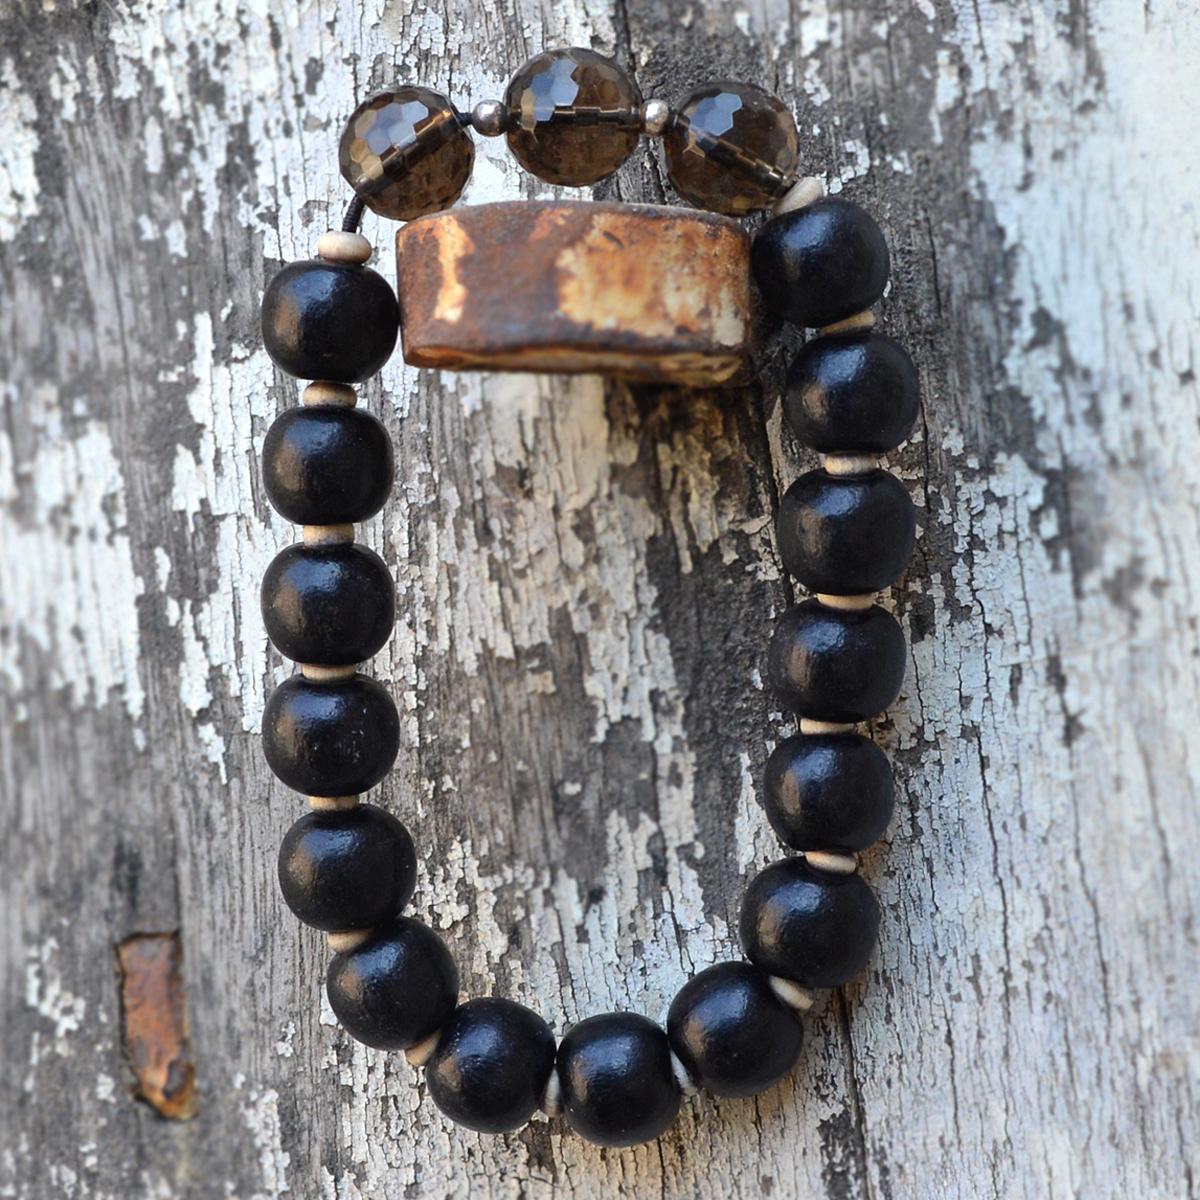 Smoky Quartz Silver Bracelet PG-156426